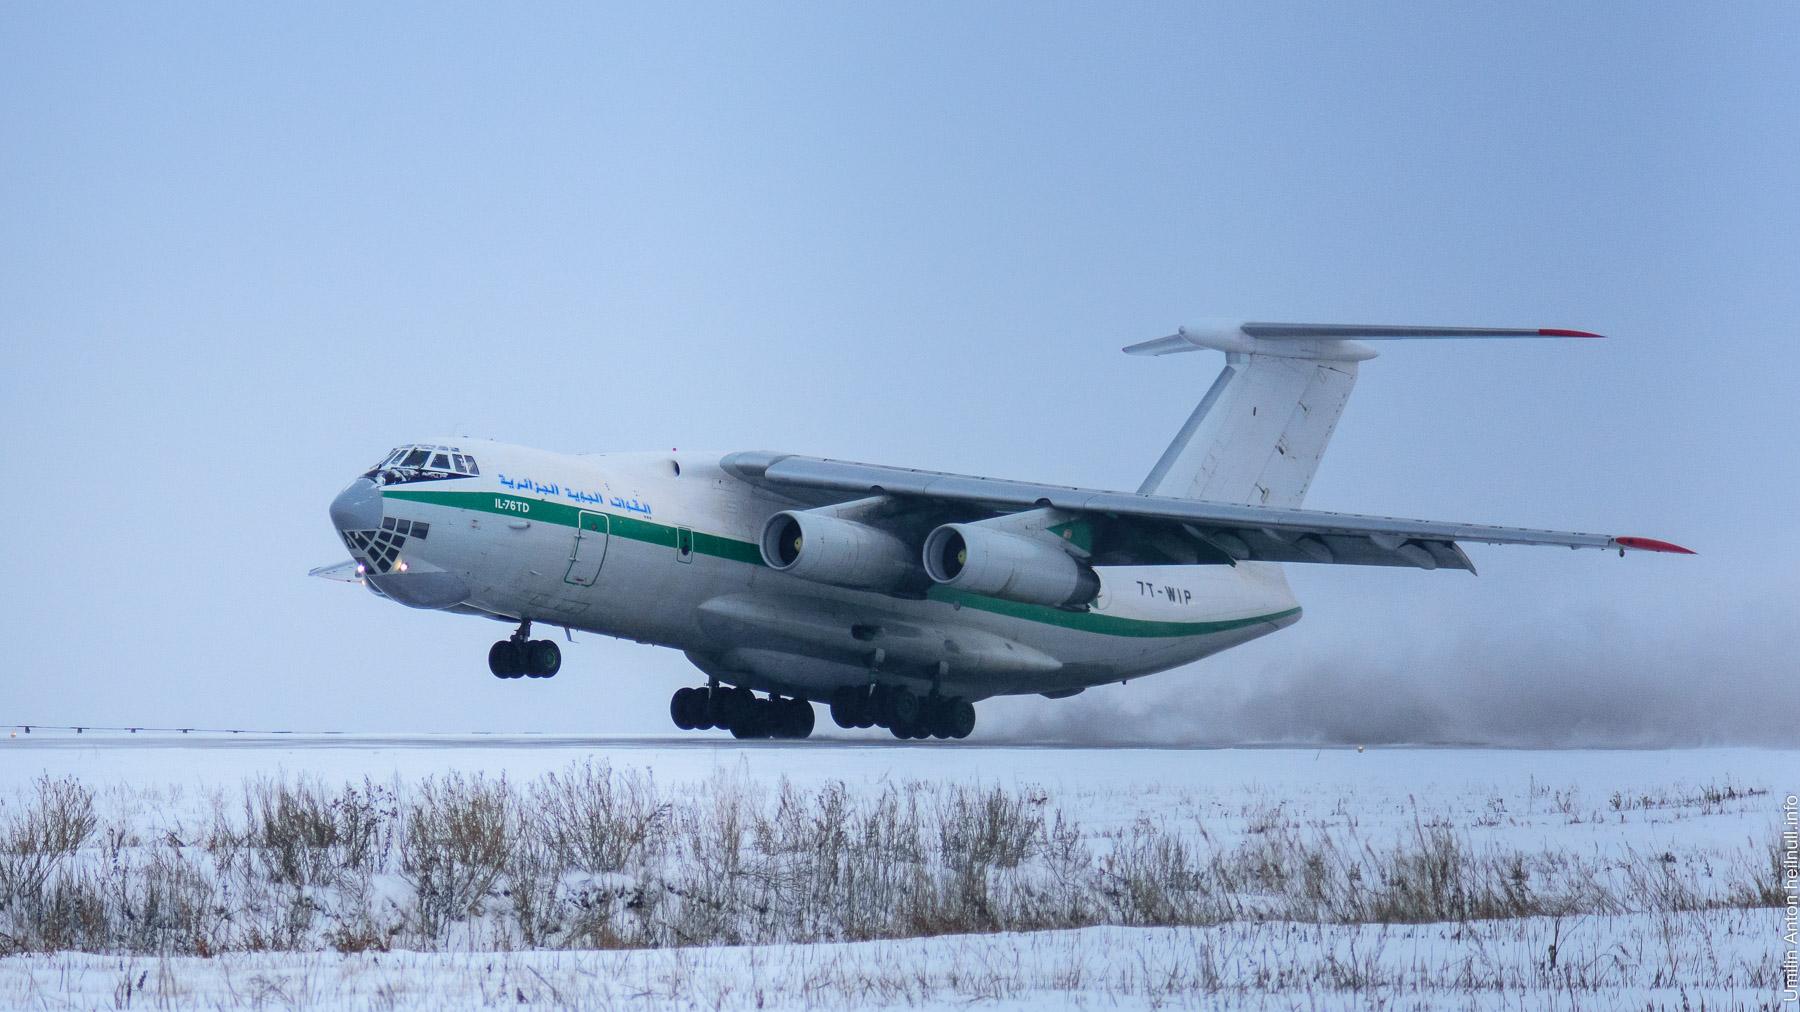 UAY_2668-8